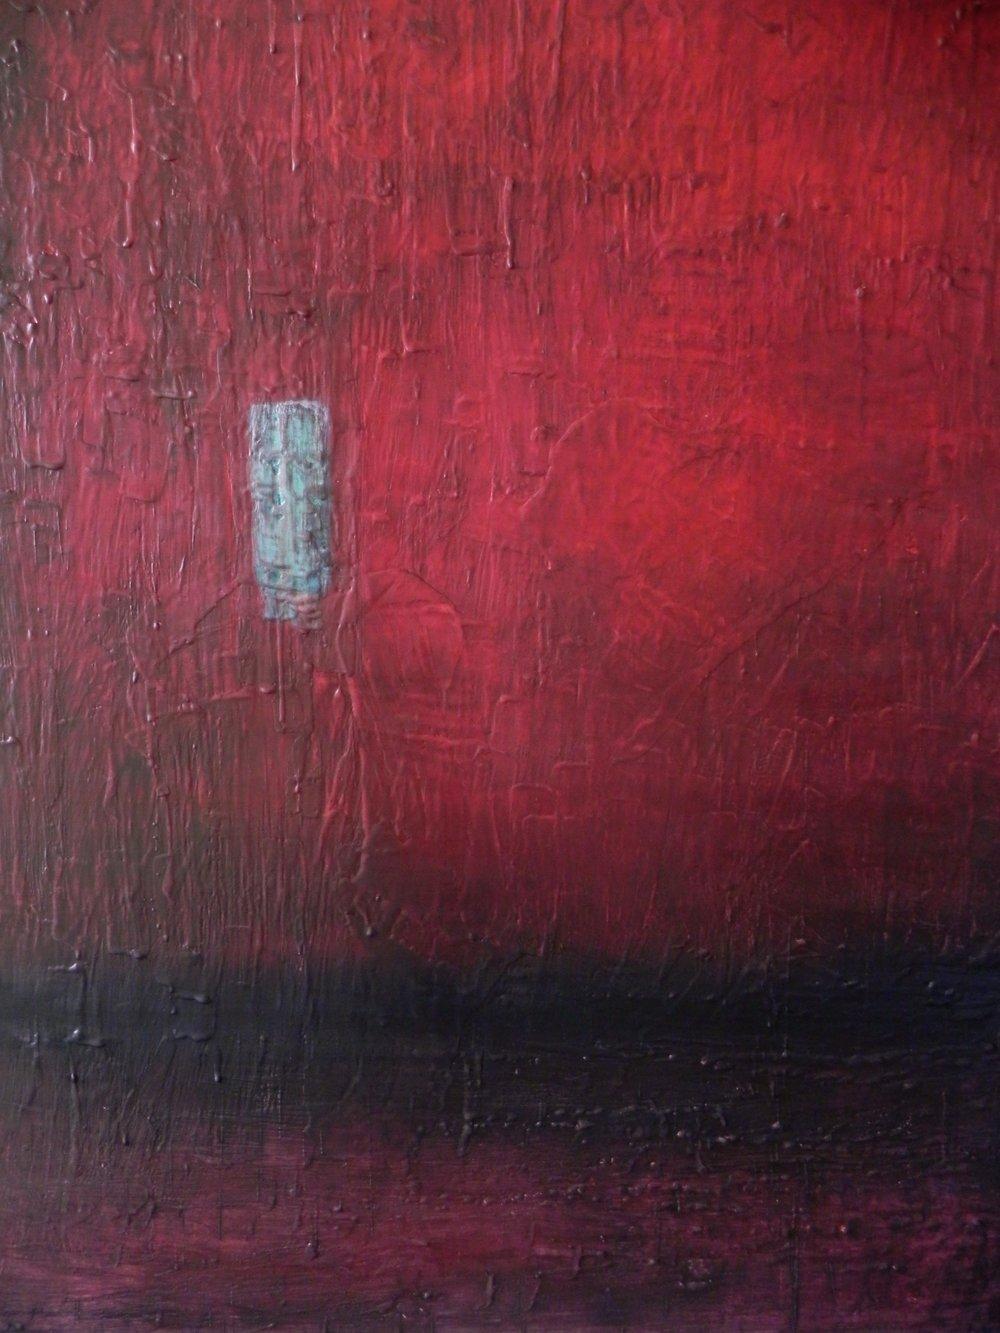 "BLAZING SKYLINE, 2014. 30"" x 24"". Cradled Wood Panel. Oil and Wax. Copyright © Karen Santos 2014."